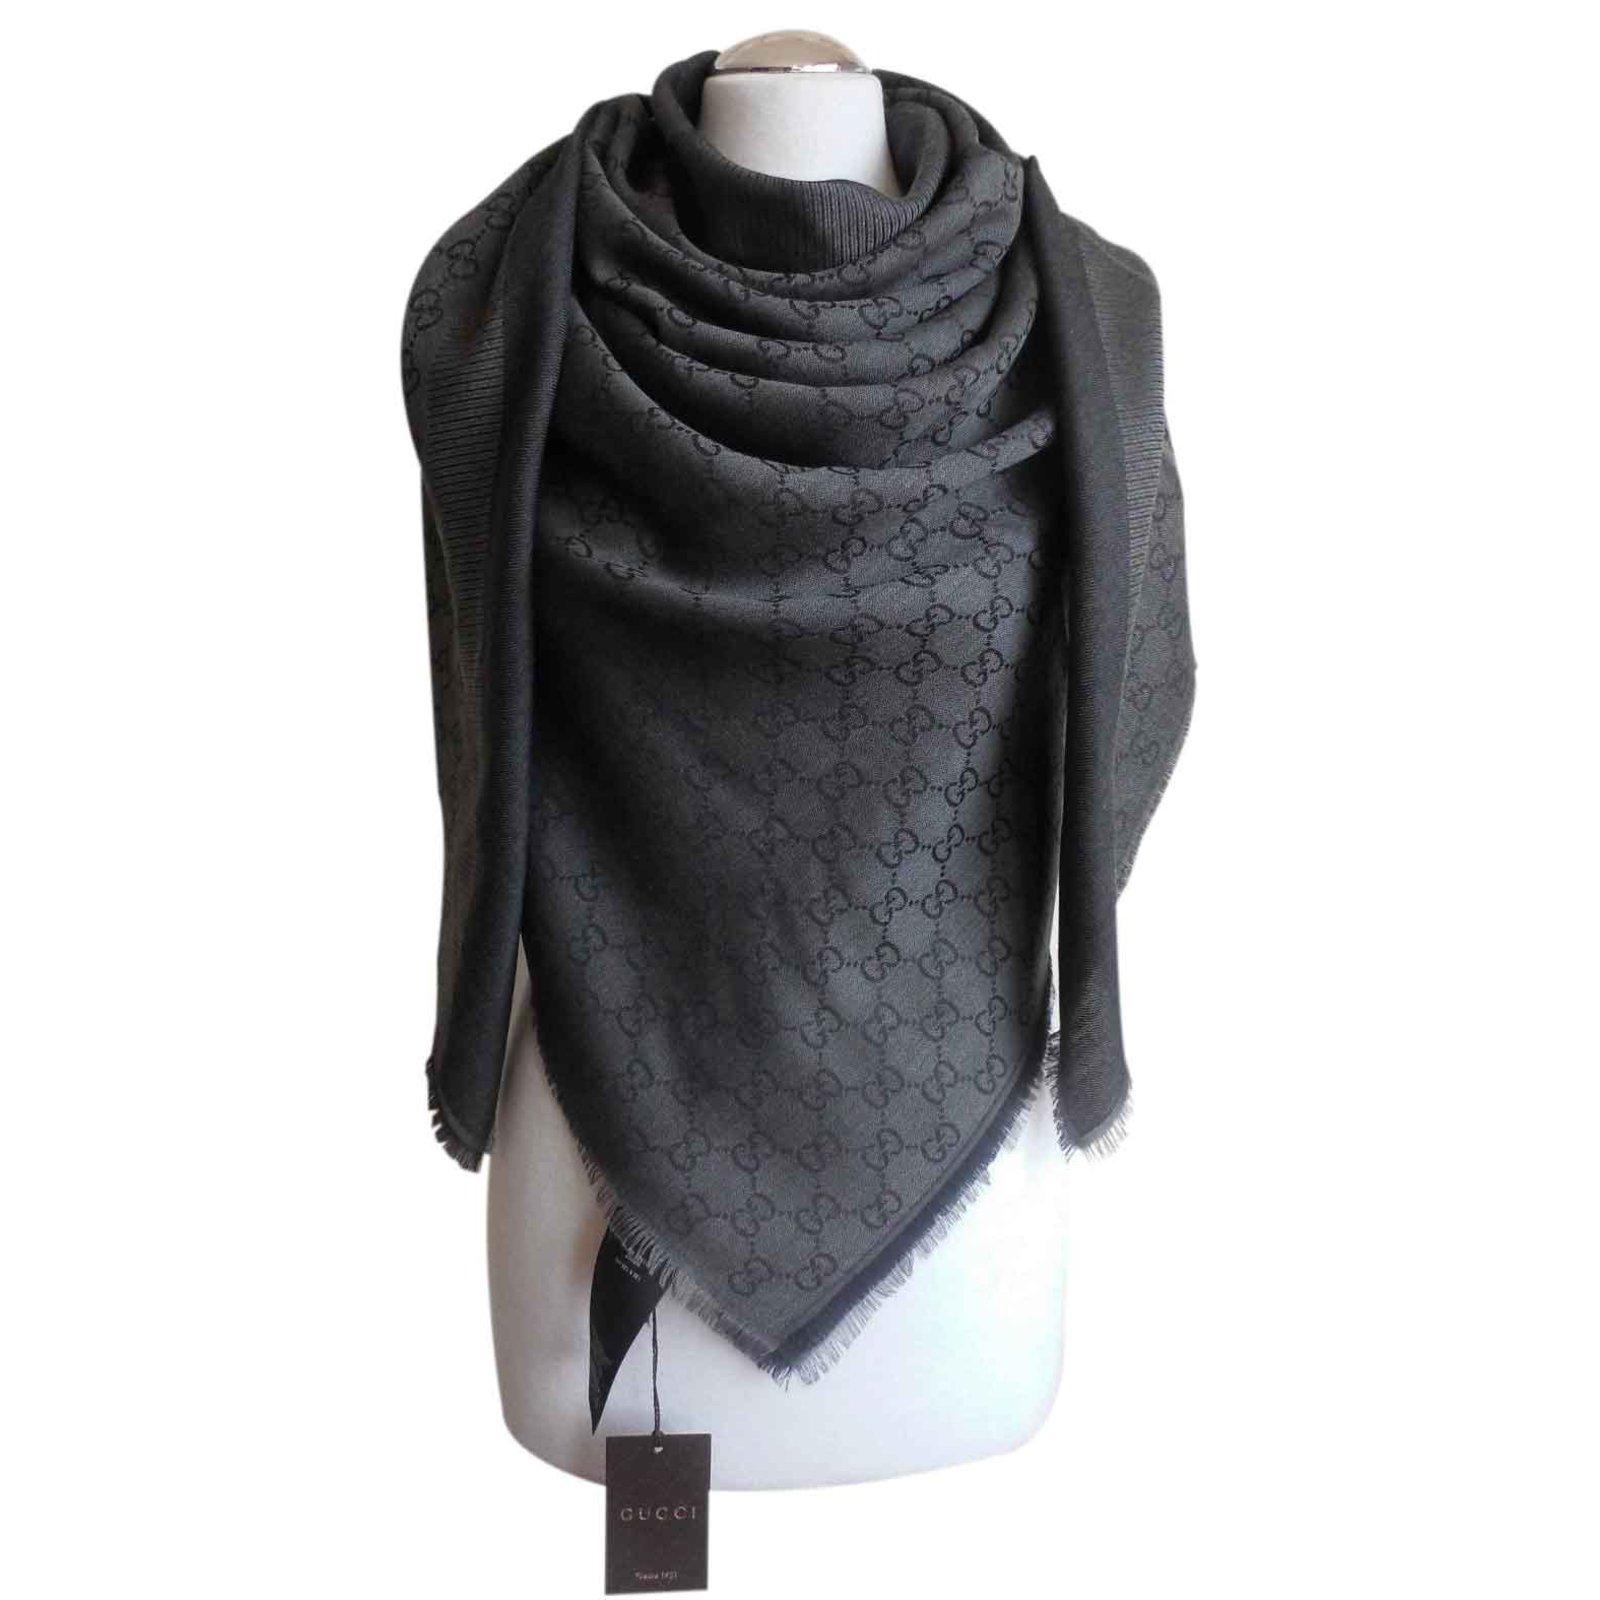 Gucci scarf Scarves Wool Black ref.23474